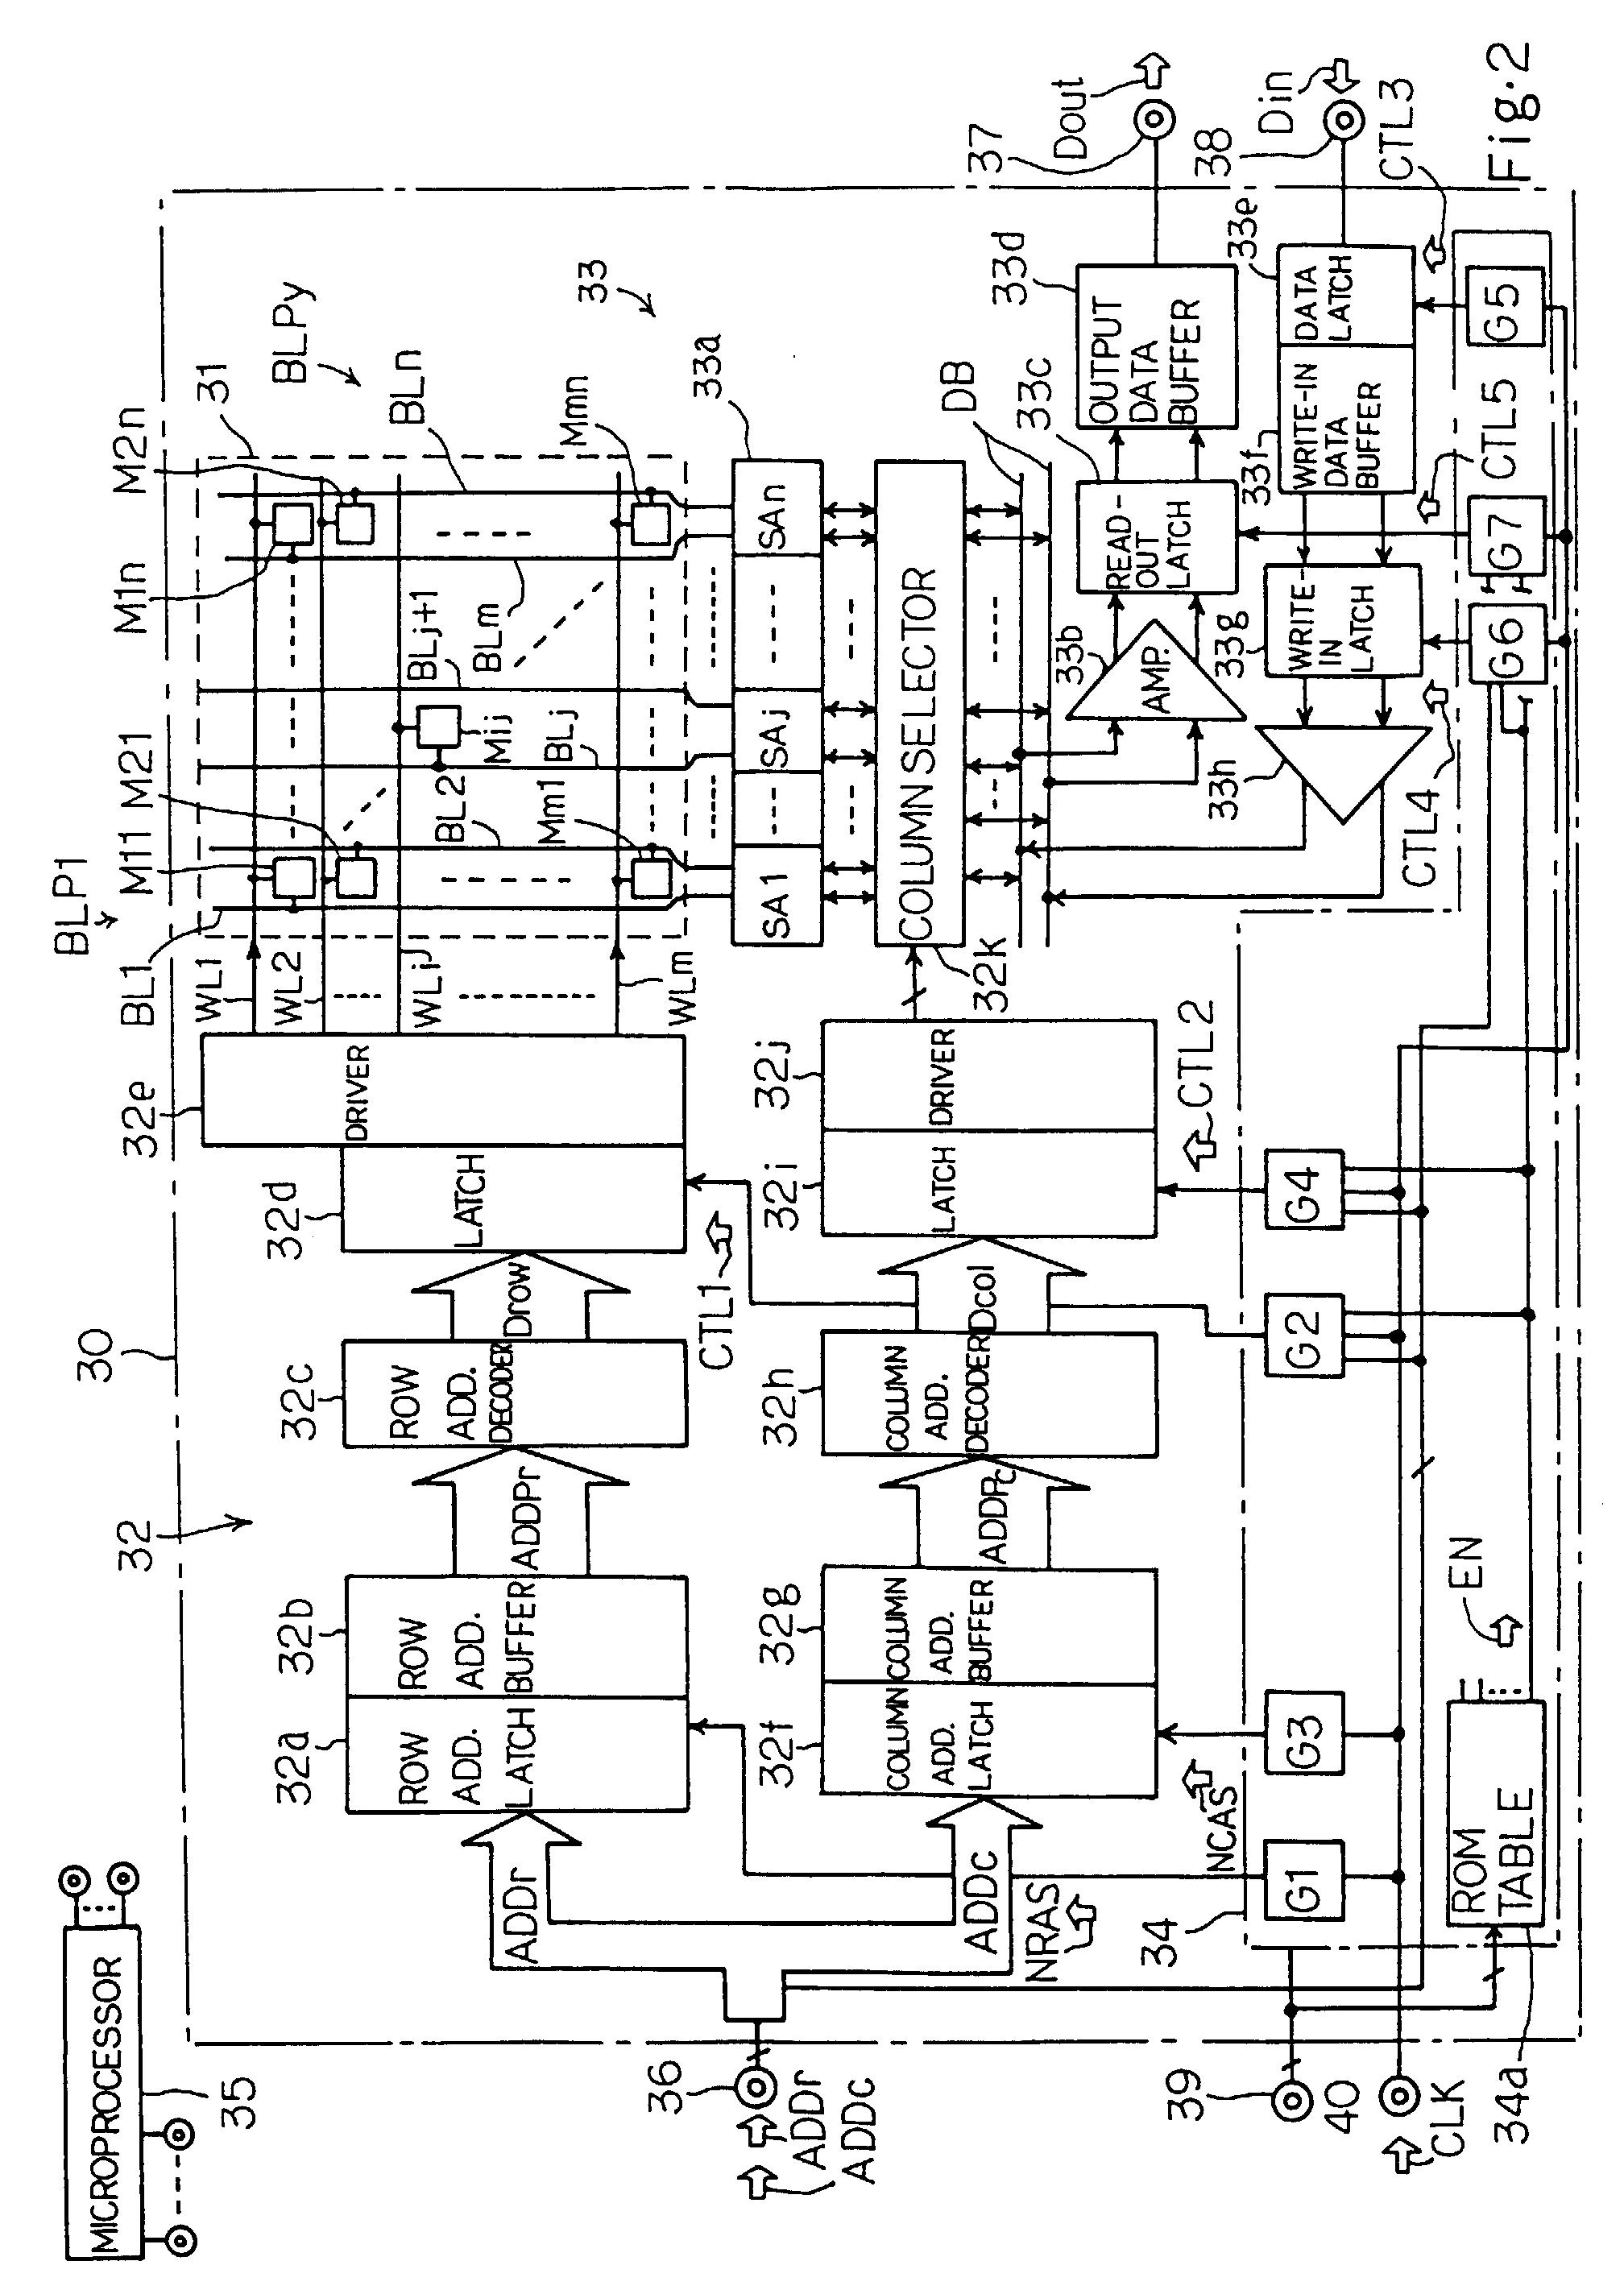 专利ep0562605b1 - dynamic